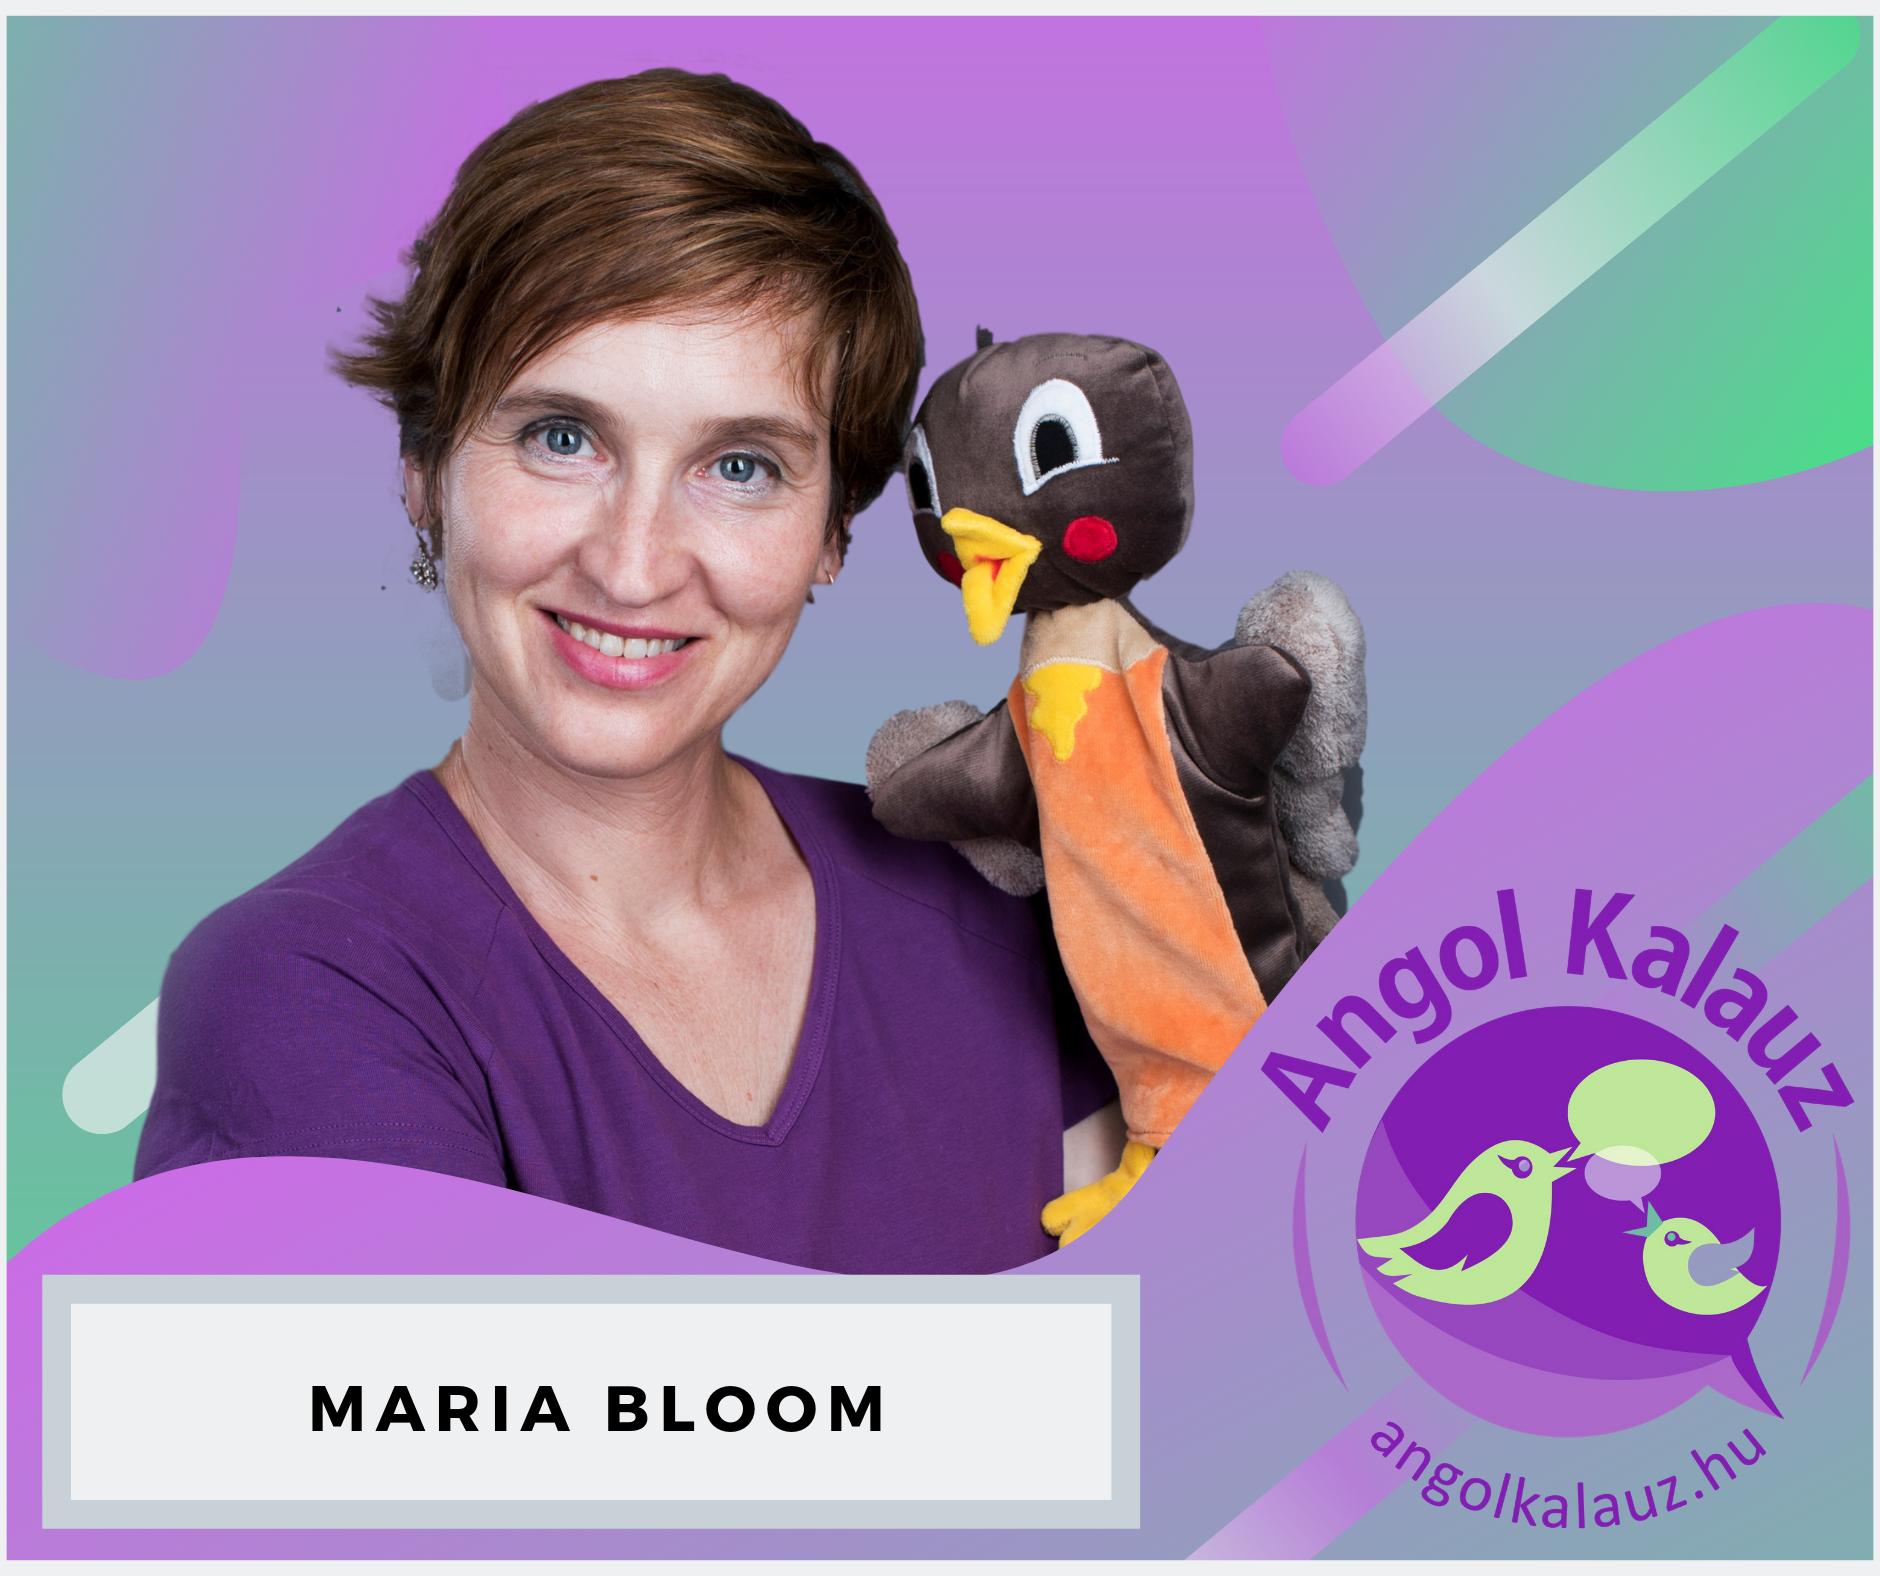 Bloom Maria